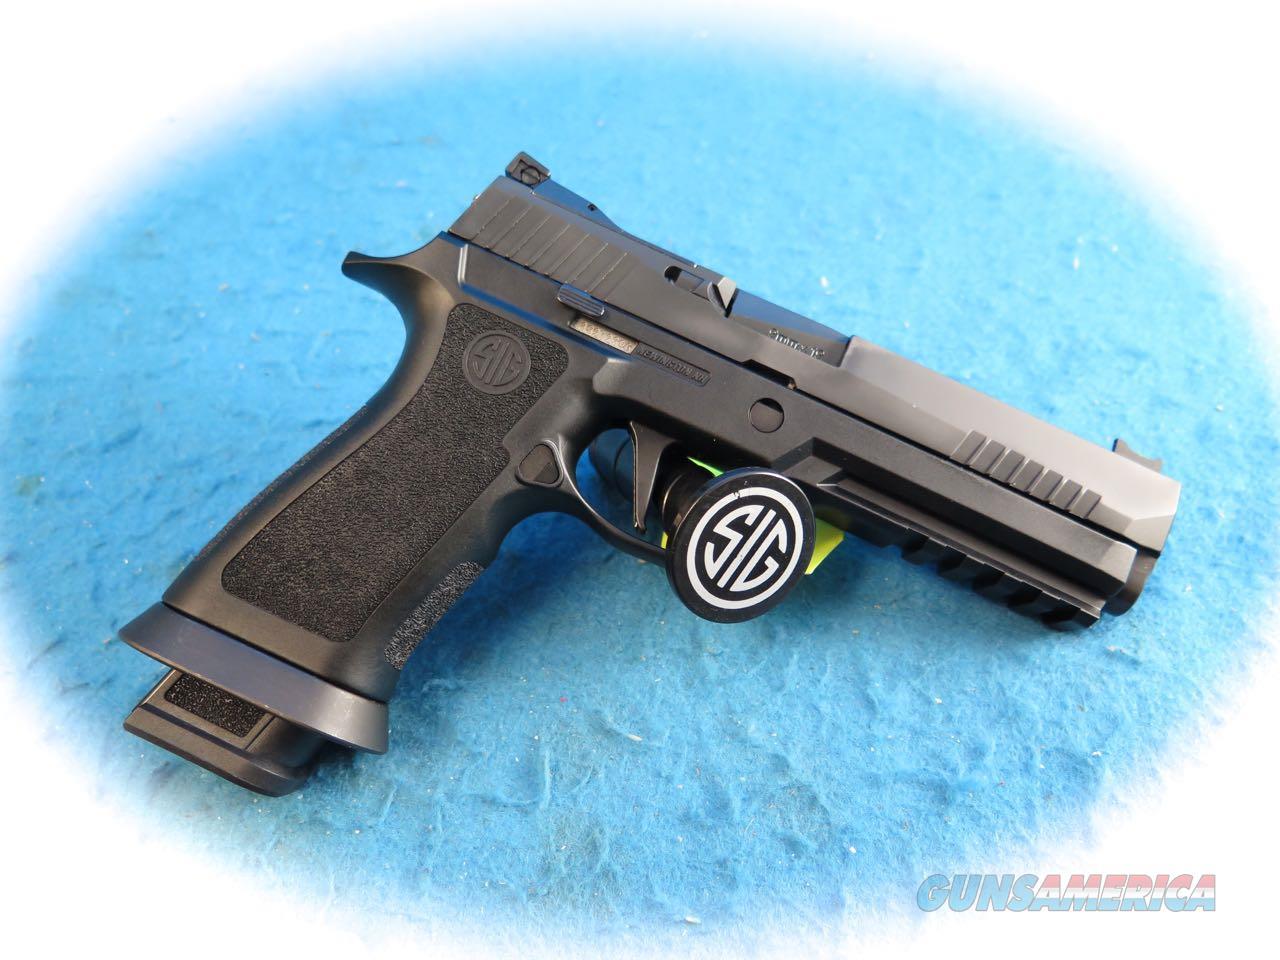 Sig Sauer P320 X-Five Full Size 9mm Pistol Model 320X5-9-BAS **New**  Guns > Pistols > Sig - Sauer/Sigarms Pistols > P320